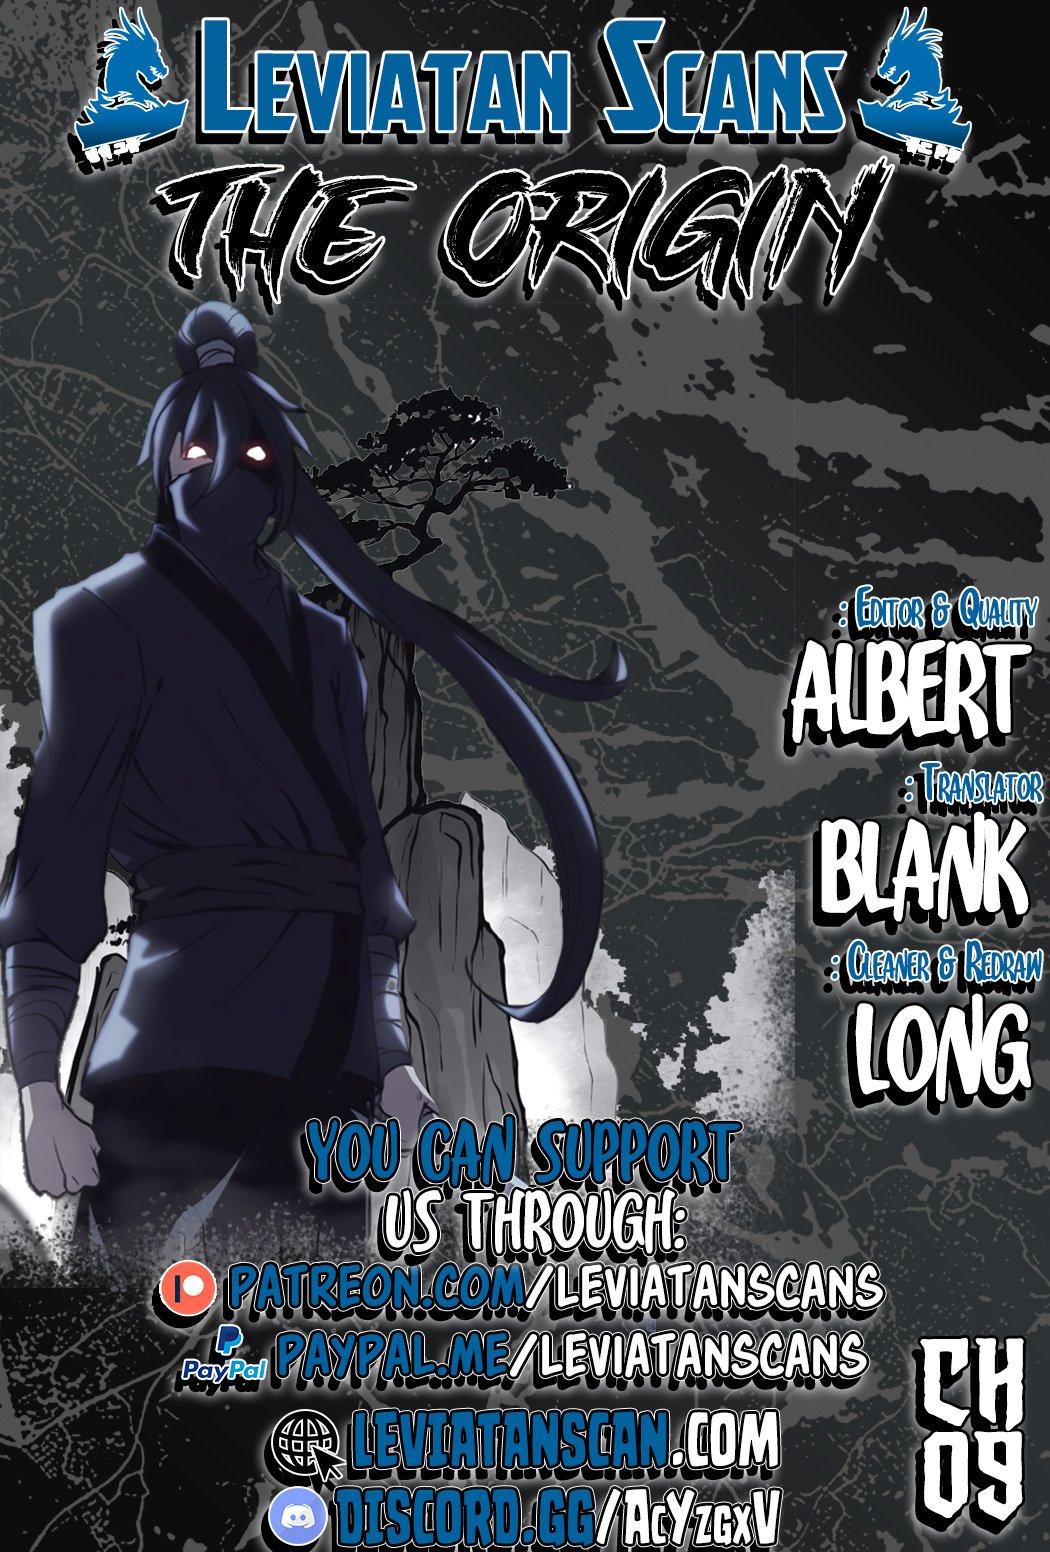 https://manga.mangadogs.com/comics/pic4/13/46989/2897376/fec4a76ff20508cb6c36cf6b37fea805.jpg Page 1